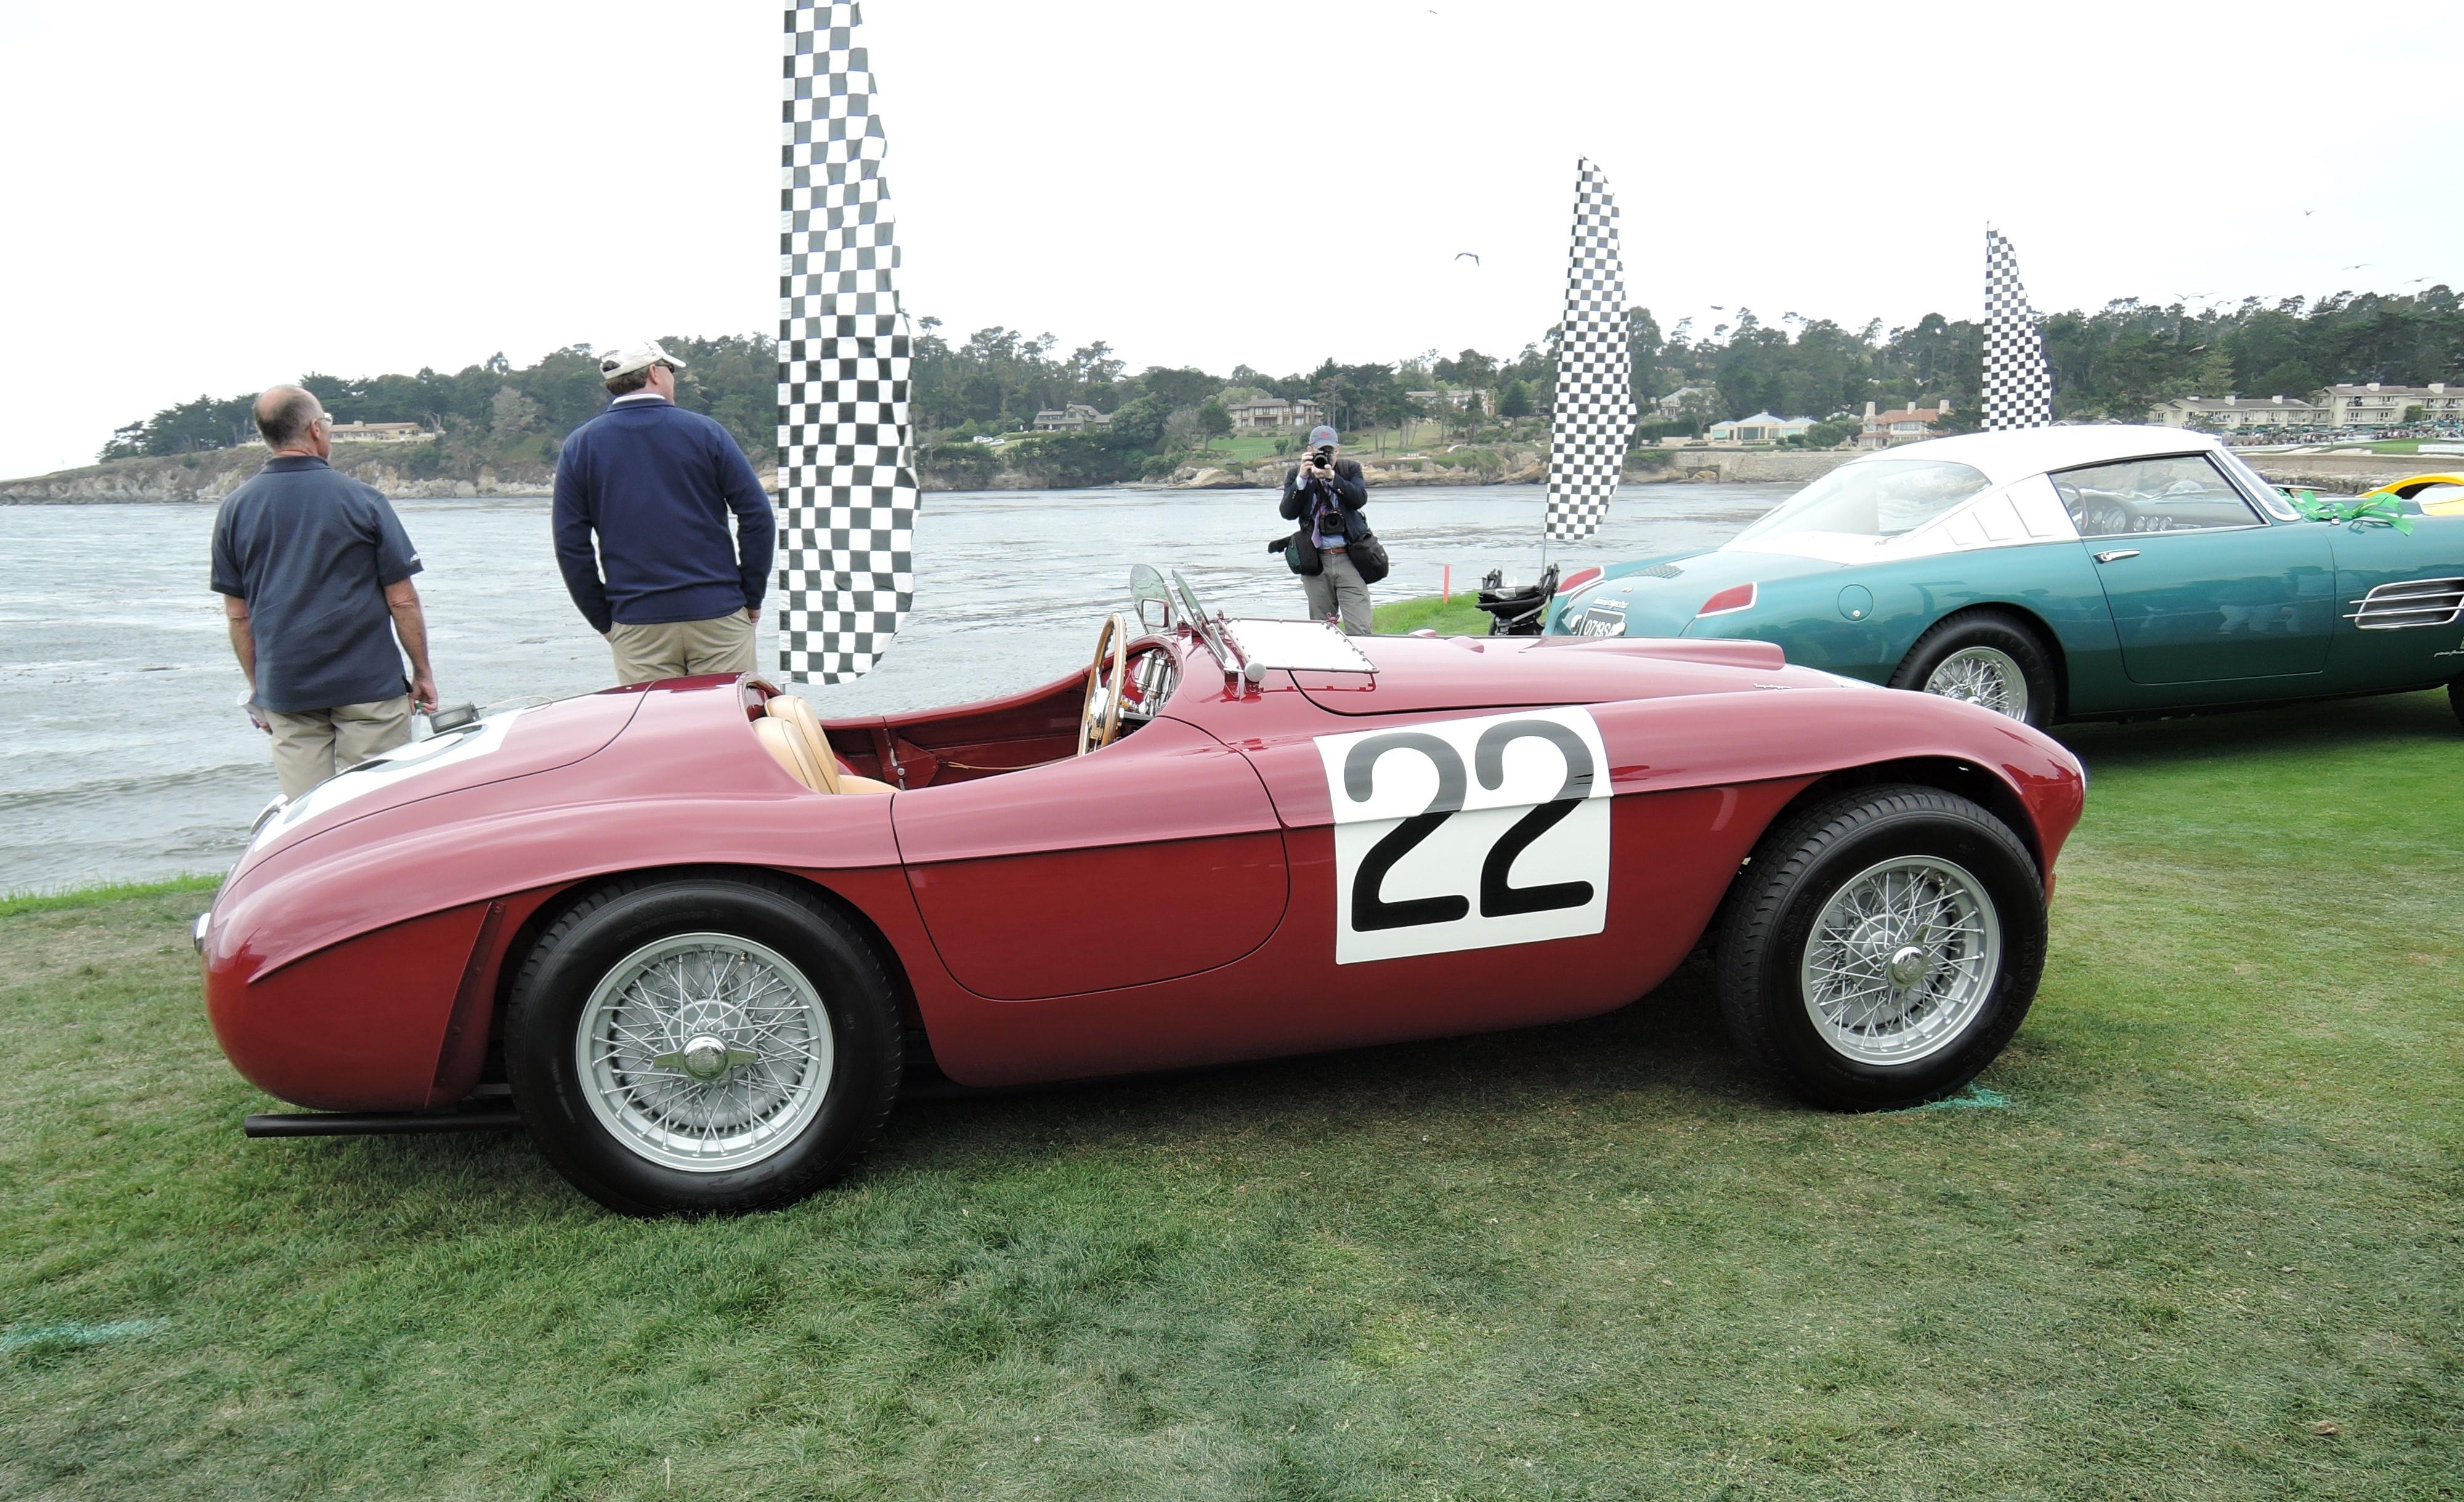 red 1949 Ferrari 166 MM Touring Barchetta; Sn 0008M - Pebble Beach Concours d'Elegance 2017